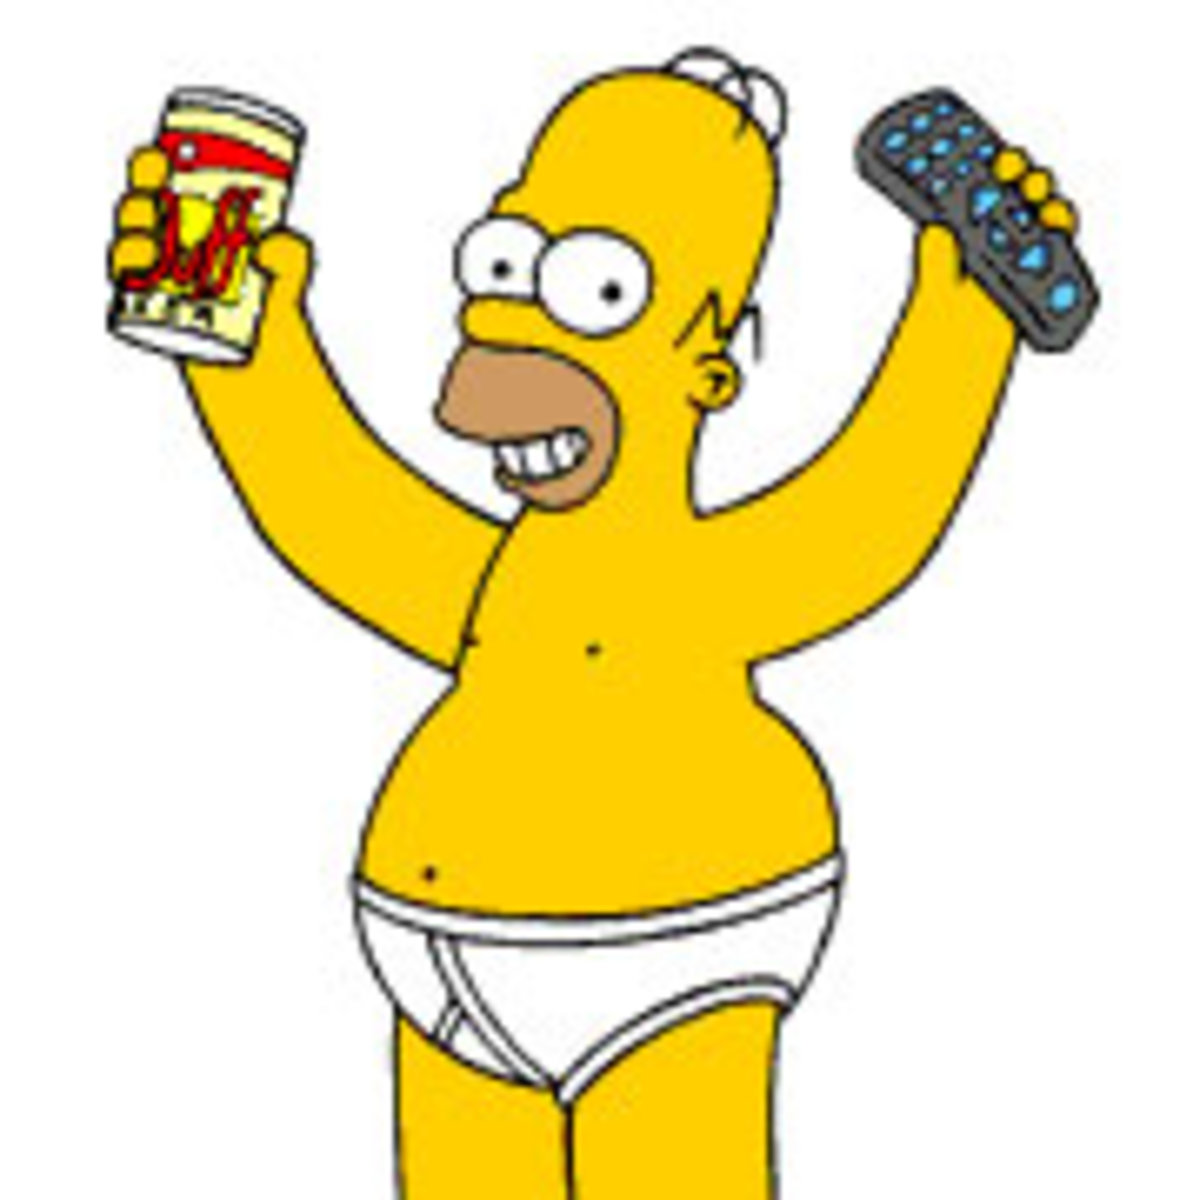 Topless Leela Marge Simpson Naked Gif